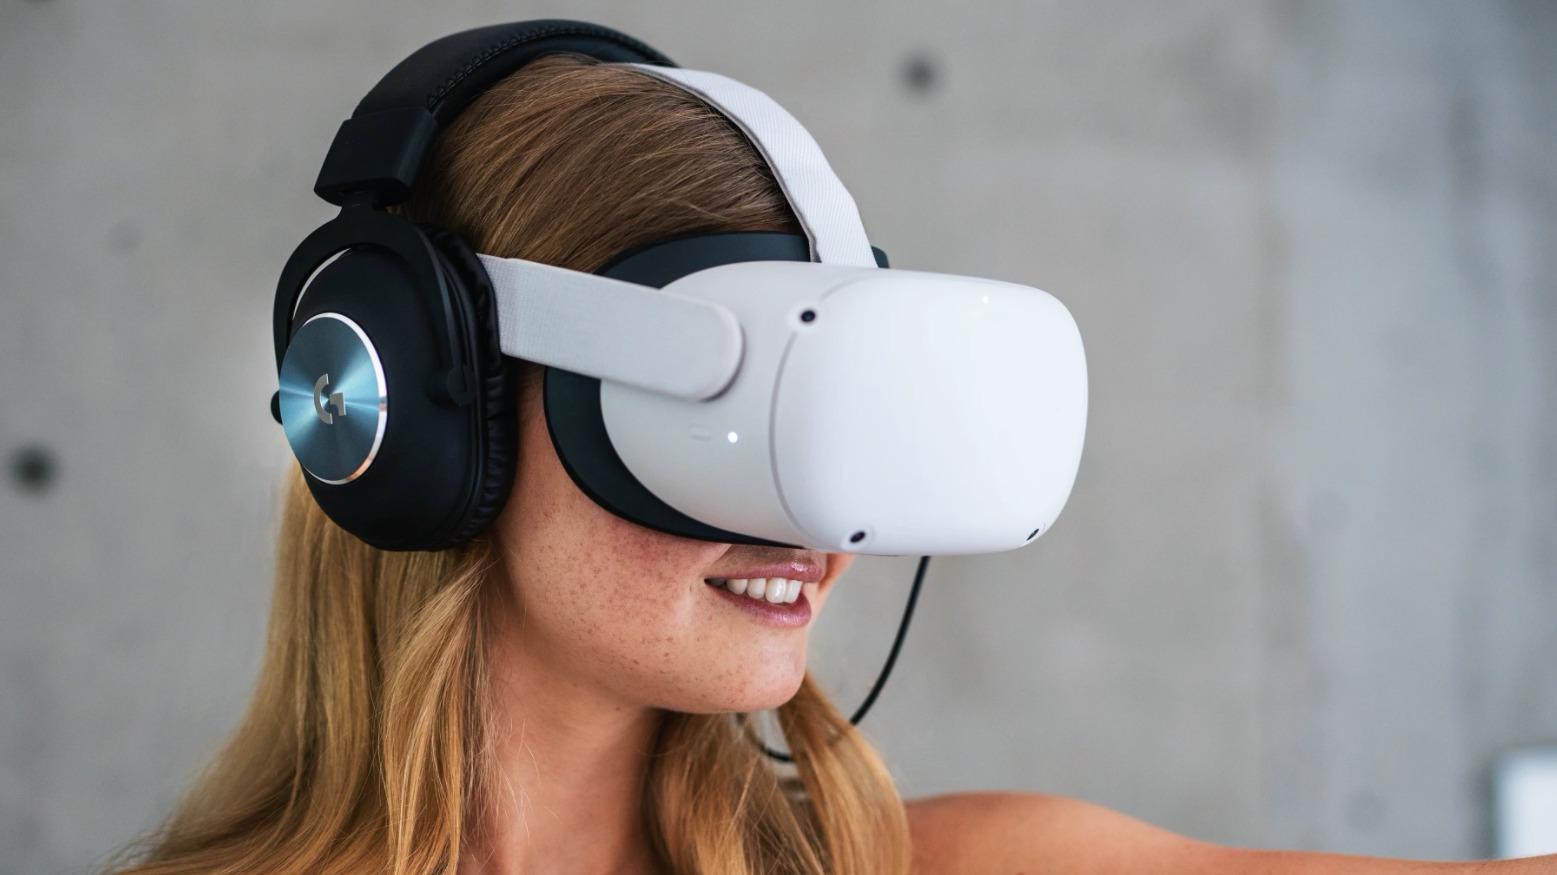 Wearable Gaming Technology Market Next Big Thing | Major Giants Microsoft, Razer, Avegant 16